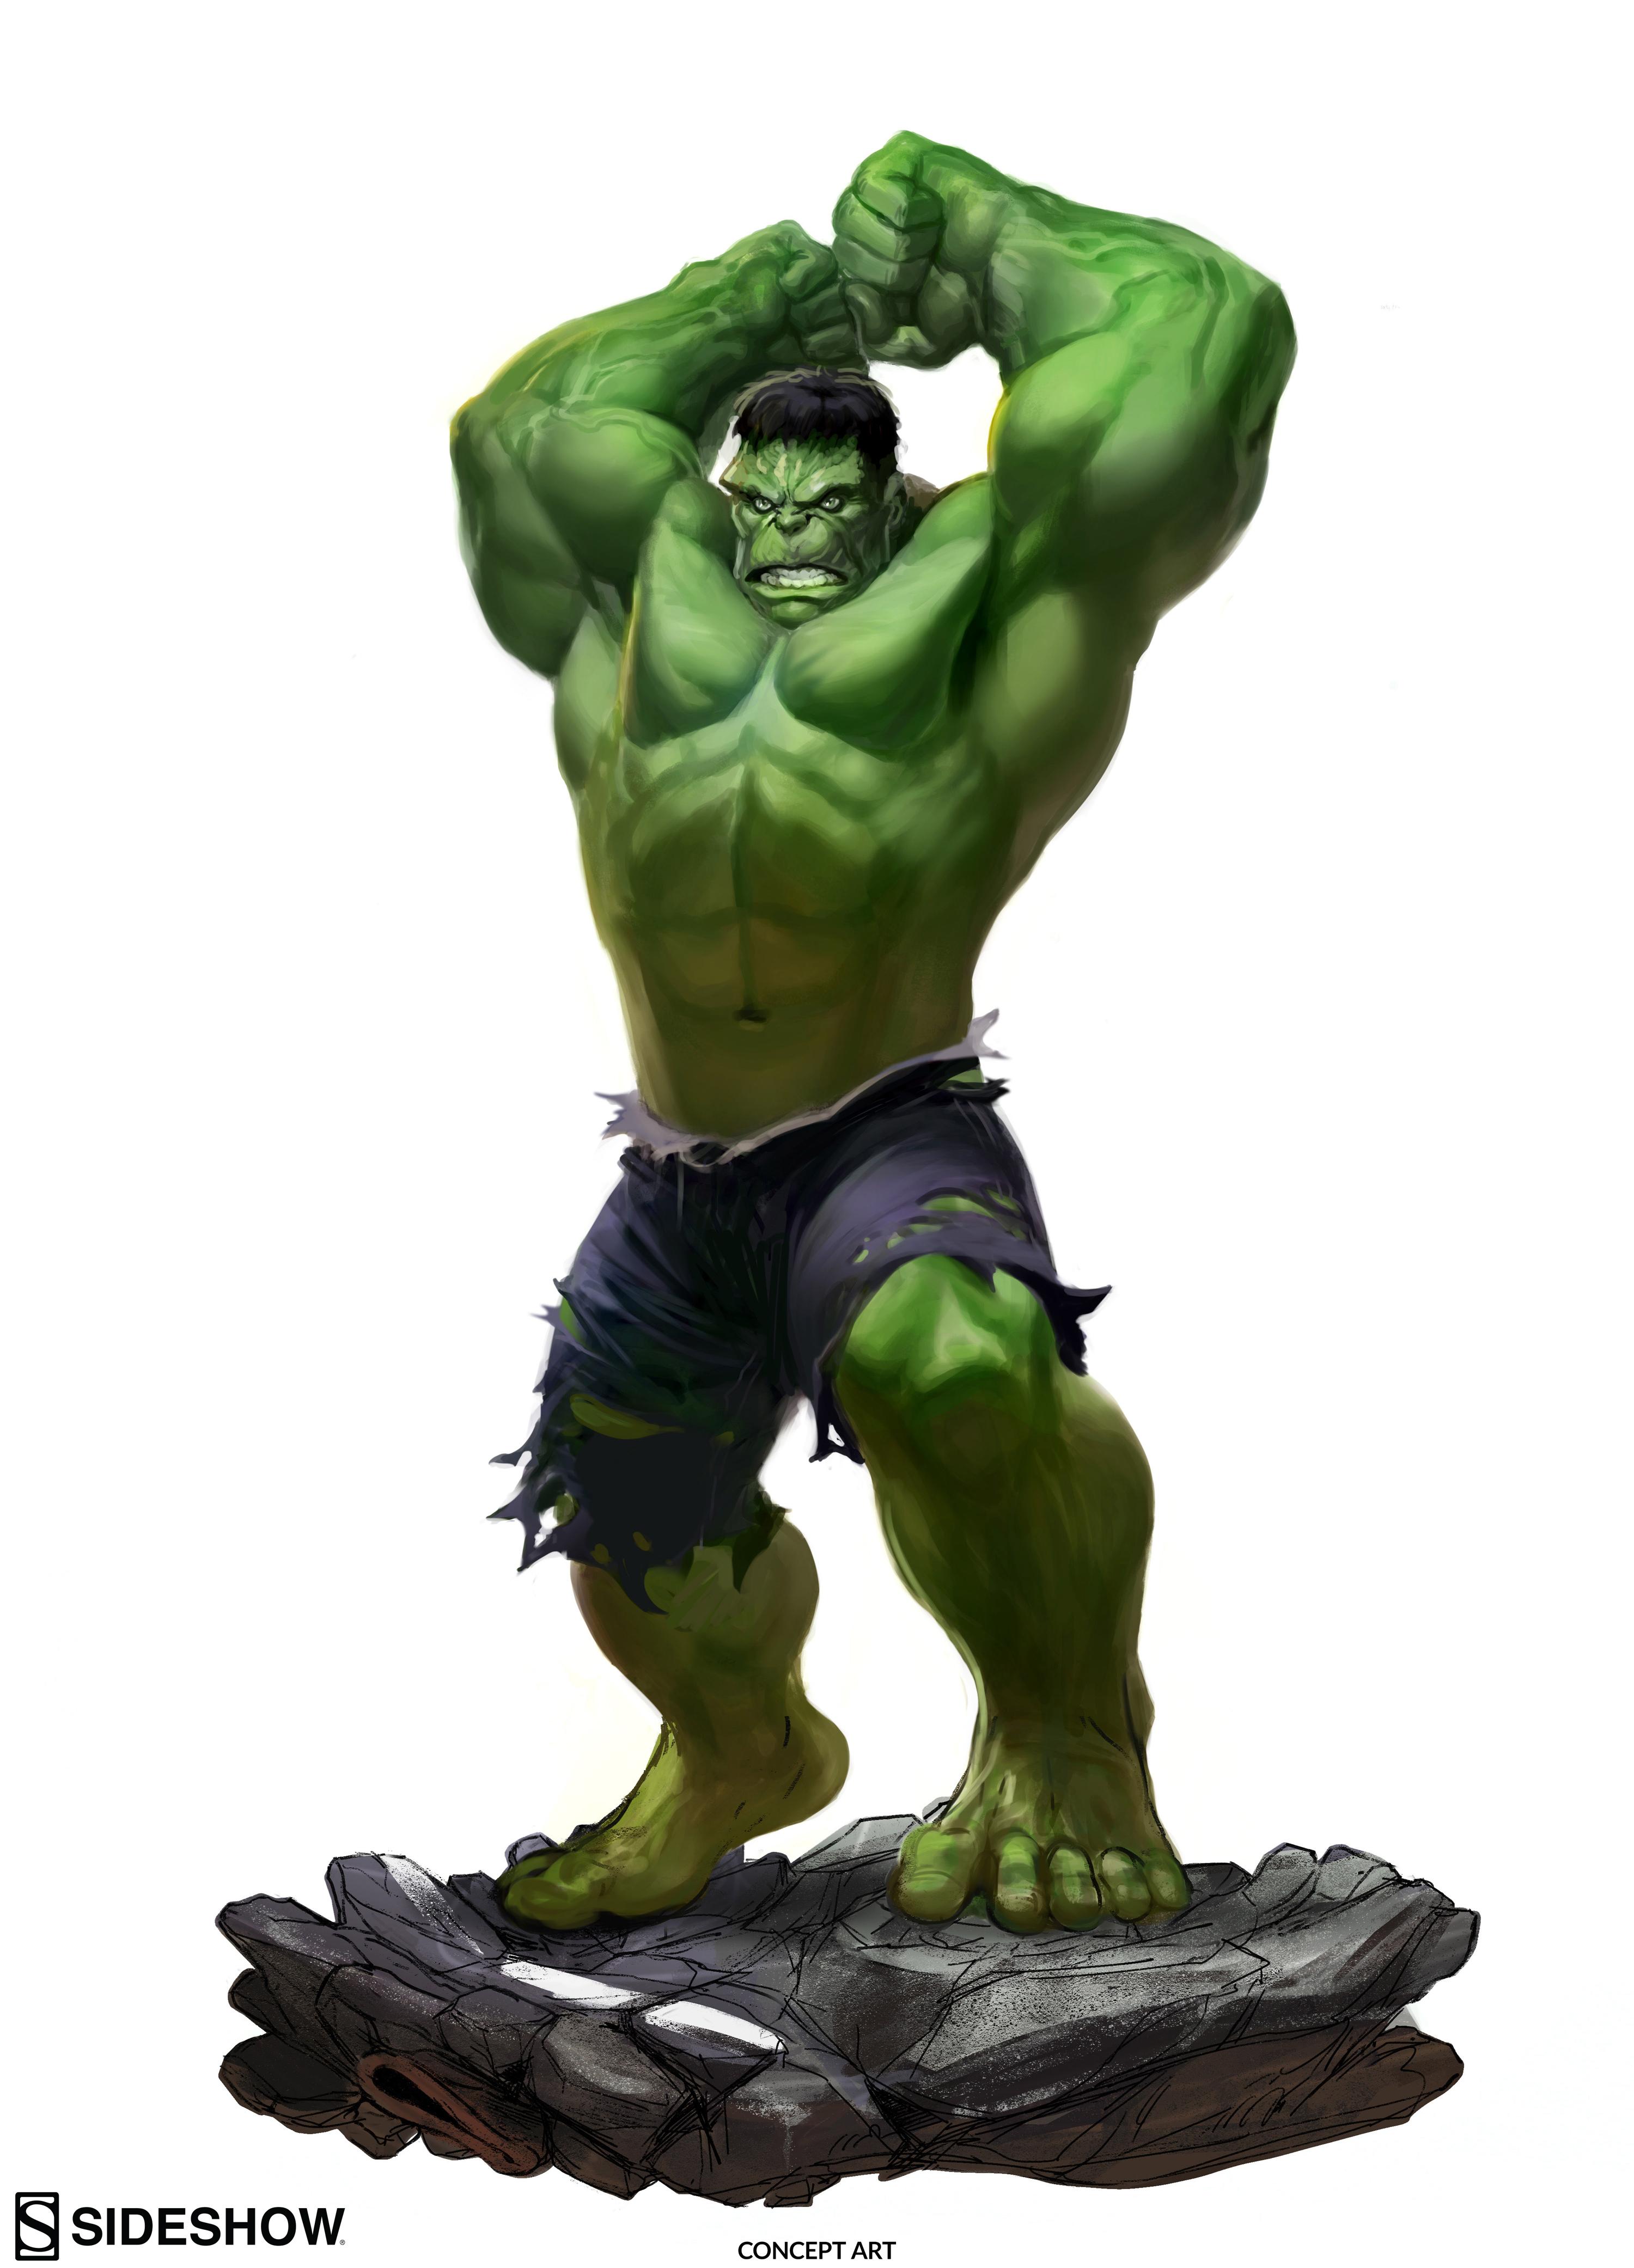 hulk - photo #35